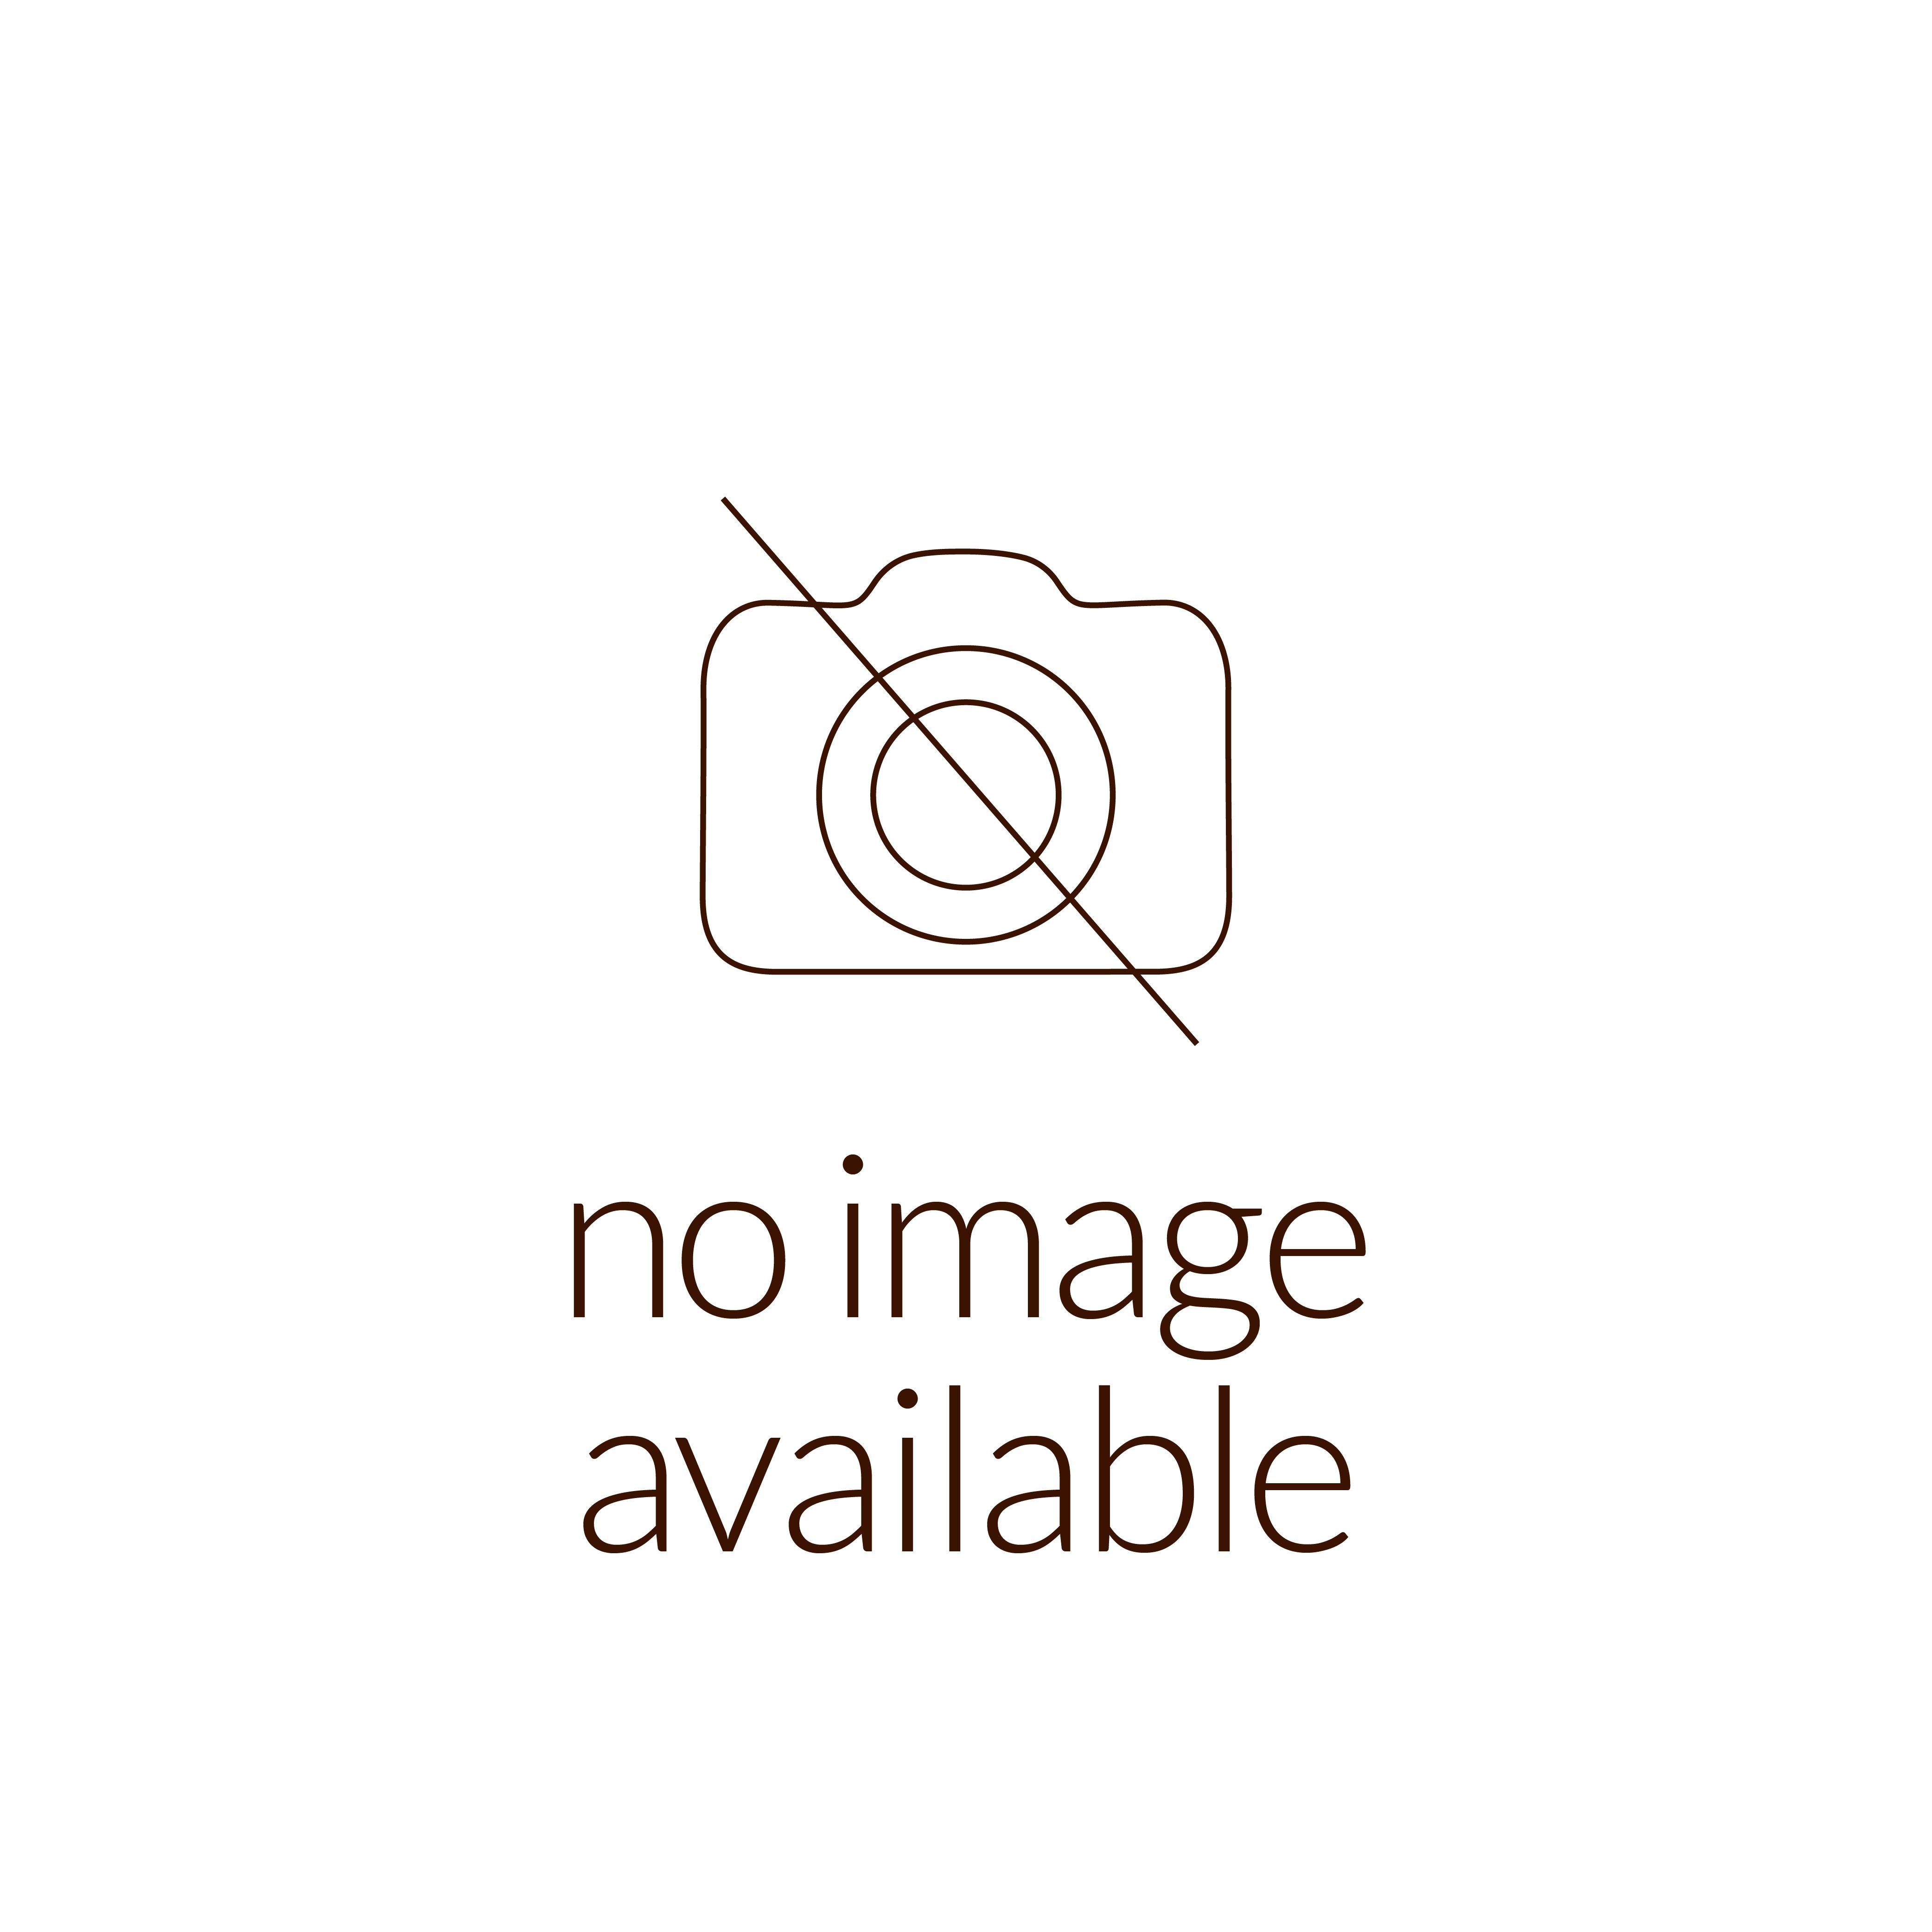 Tribe of Judah, Salvador Dali - 75x60mm Oval Bronze Medal with Color Silkscreen